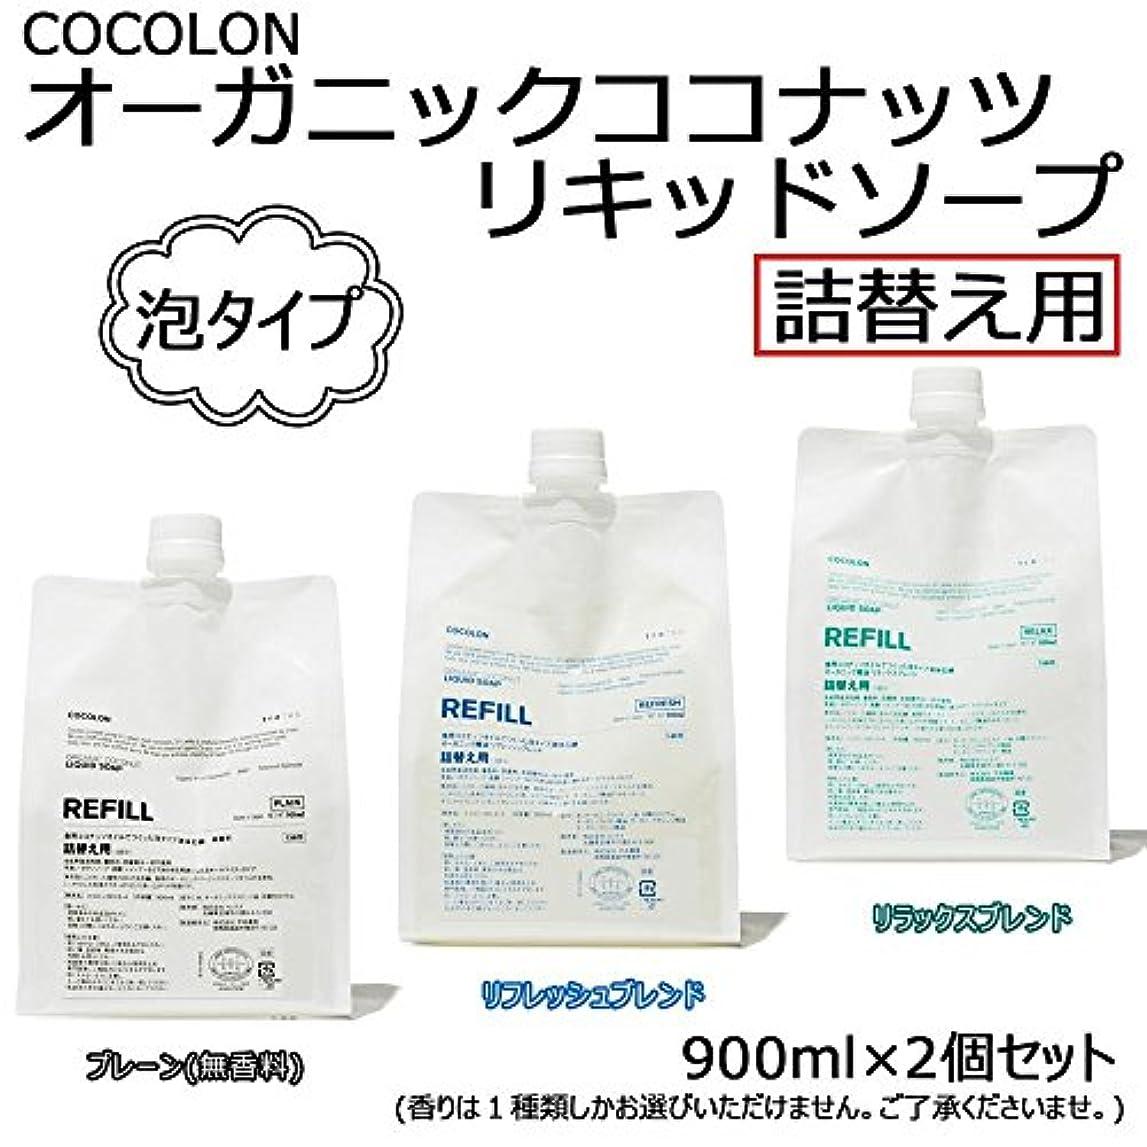 COCOLON ココロン オーガニックココナッツリキッドソープ 泡タイプ 詰替え用 900ml 2個セット【同梱?代引不可】 ■3種類の内「リフレッシュブレンド」のみです